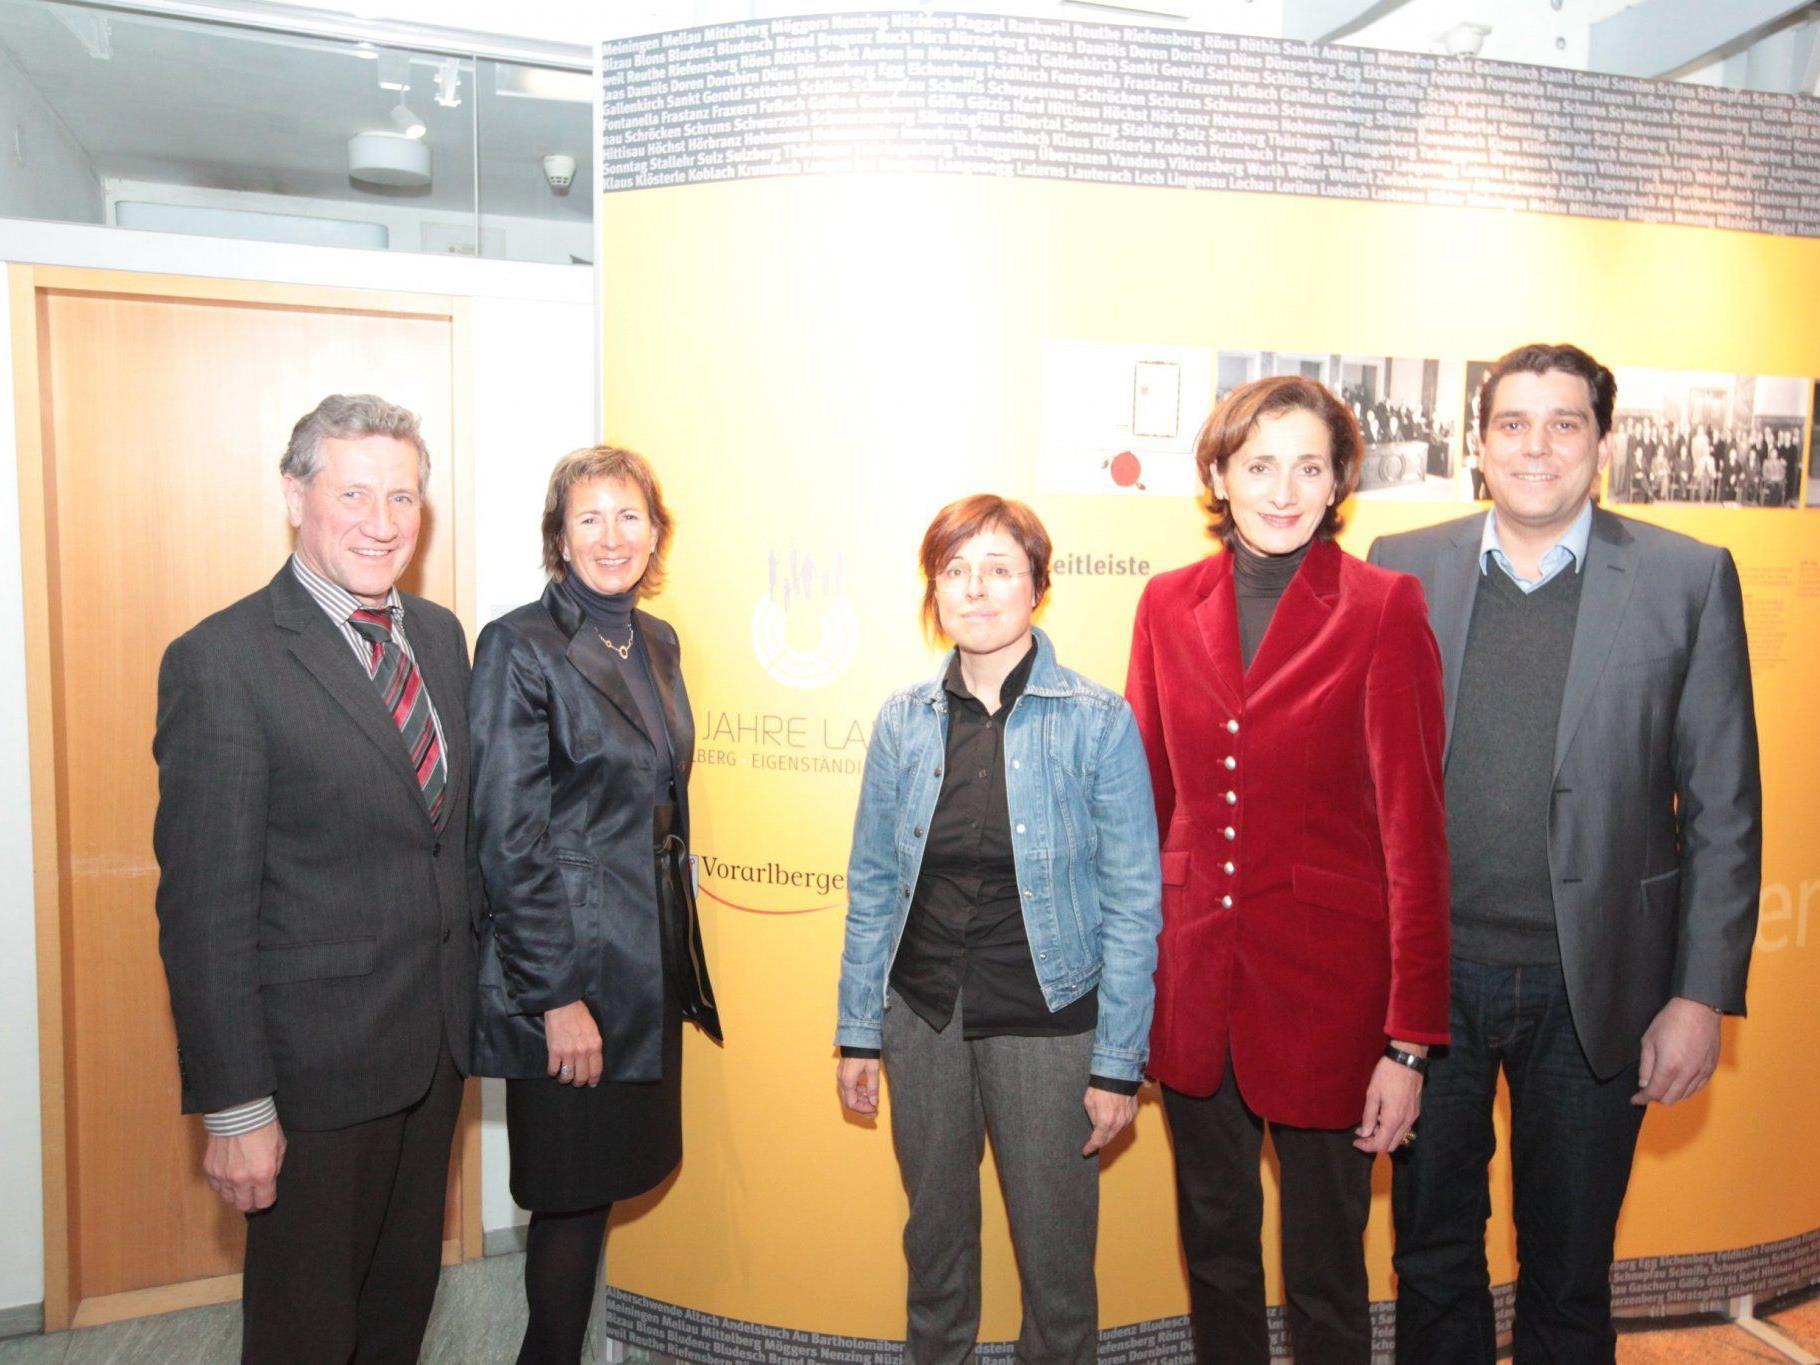 Landesrat Erich Schwärzler, Landtagsvizepräsidentin Gabriele Nußbaumer, Referentin Eva Grabherr, Landtagspräsidentin Bernadette Mennel, Bürgermeister Harald Köhlmeier.